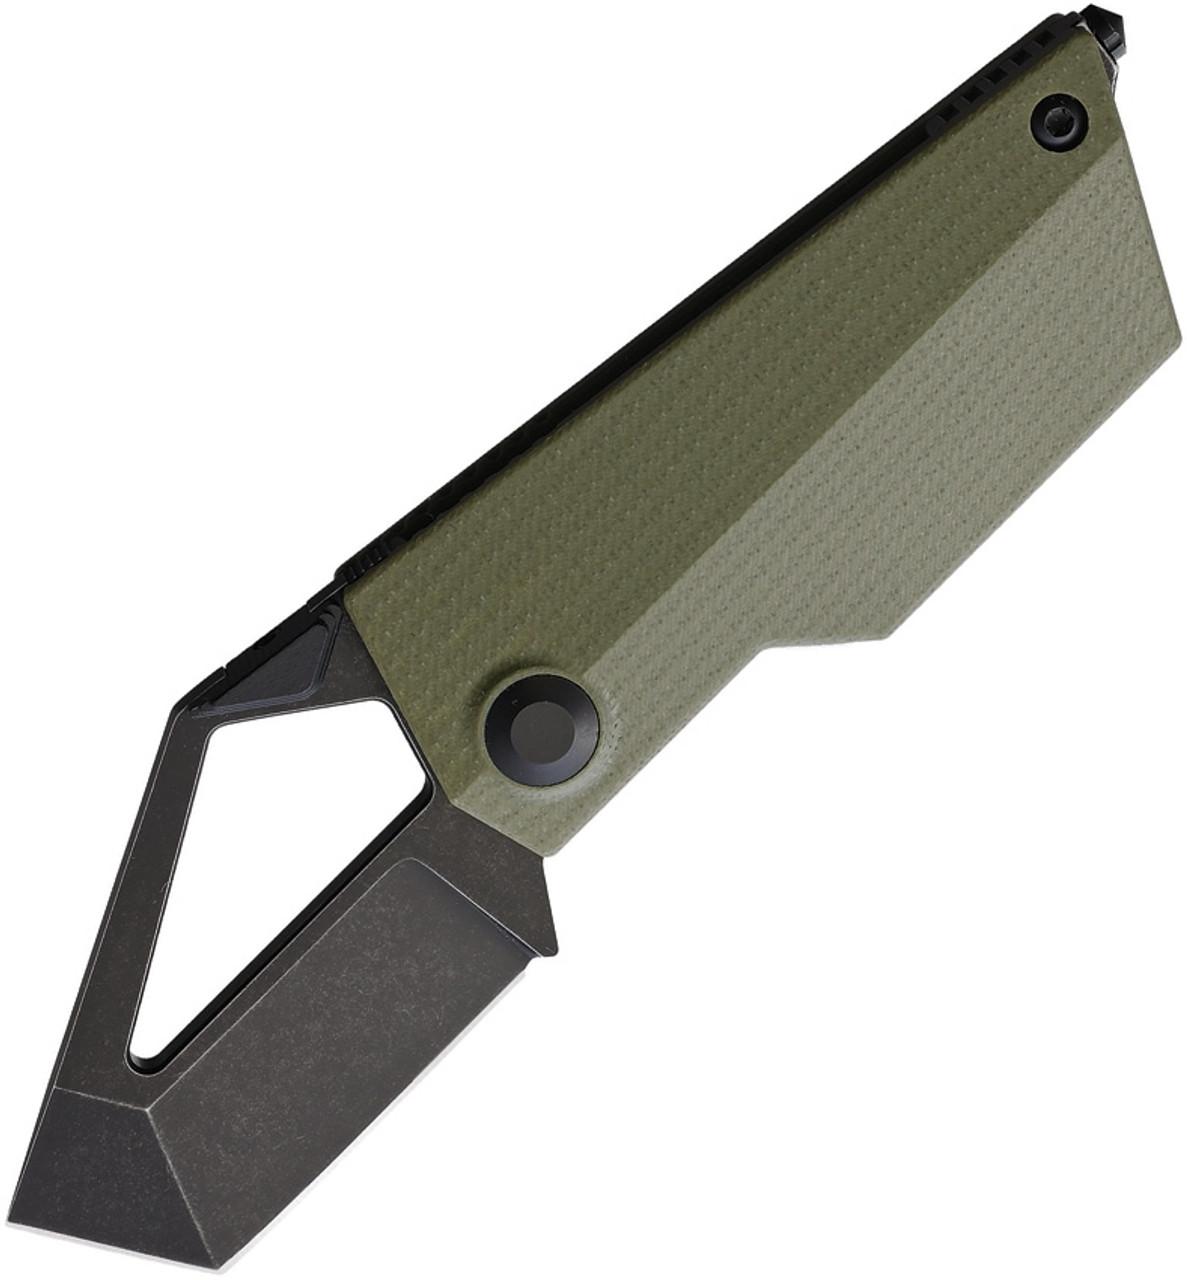 "Kizer Cutlery Cyberblade Folding Knife KIV2563A1, 2.1"" Bohler M390 Black Plain Blade, Green G-10 Handle"